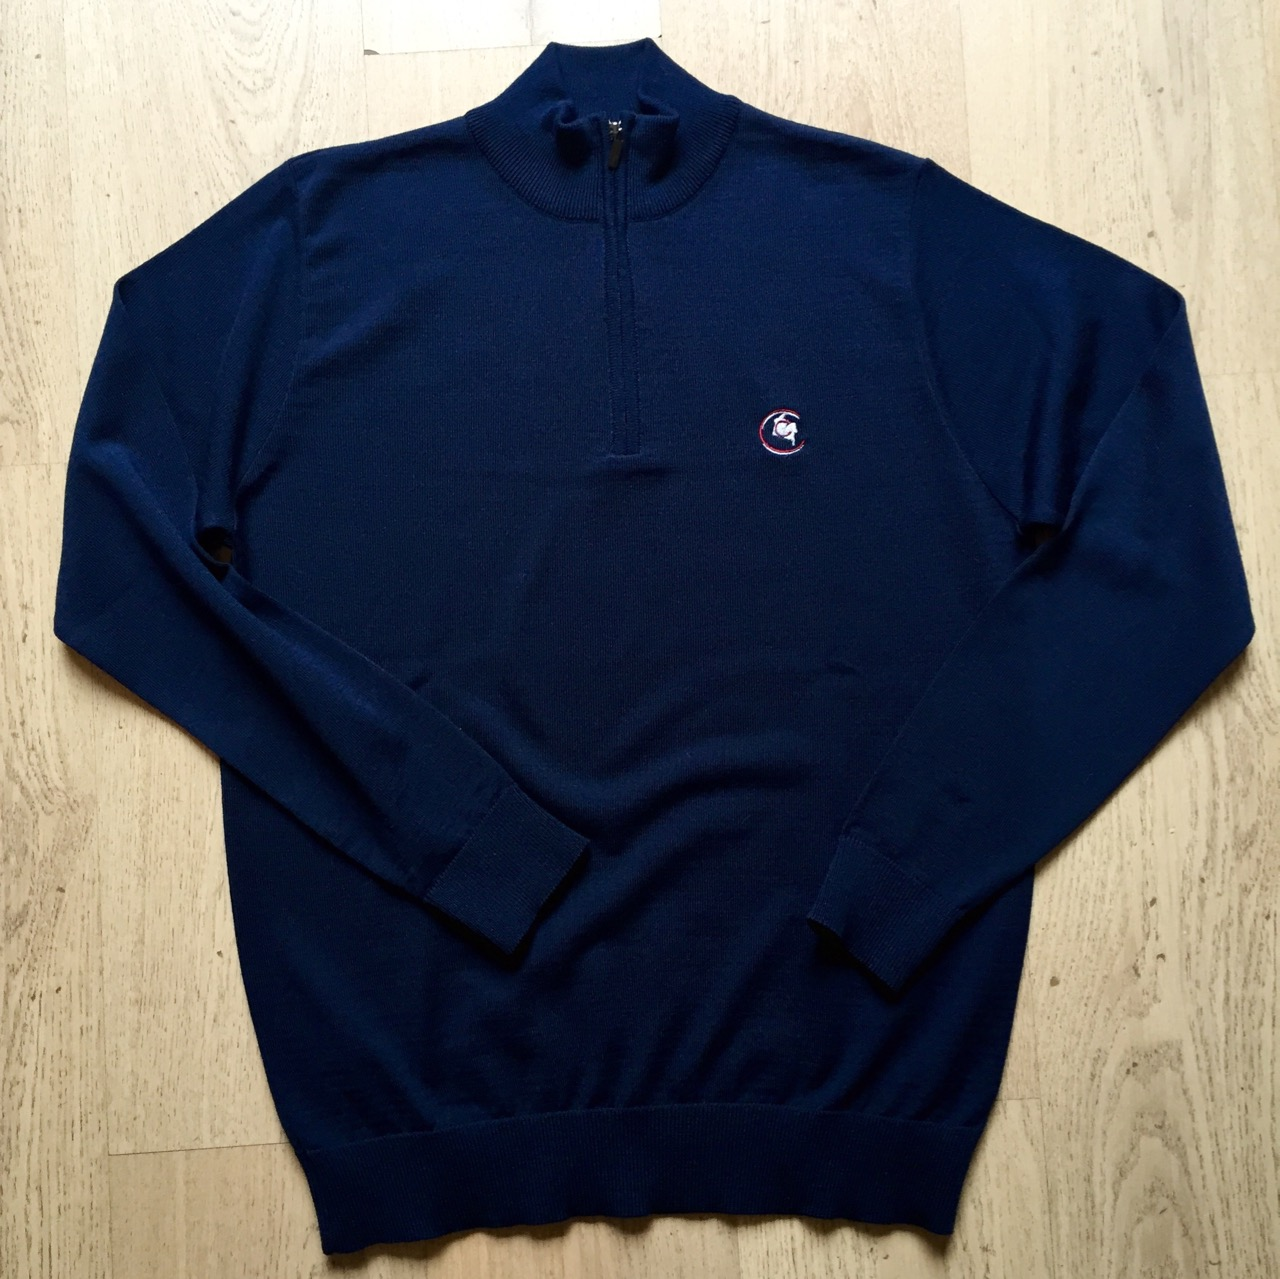 Sweater Hombres Uniformes Corporativos